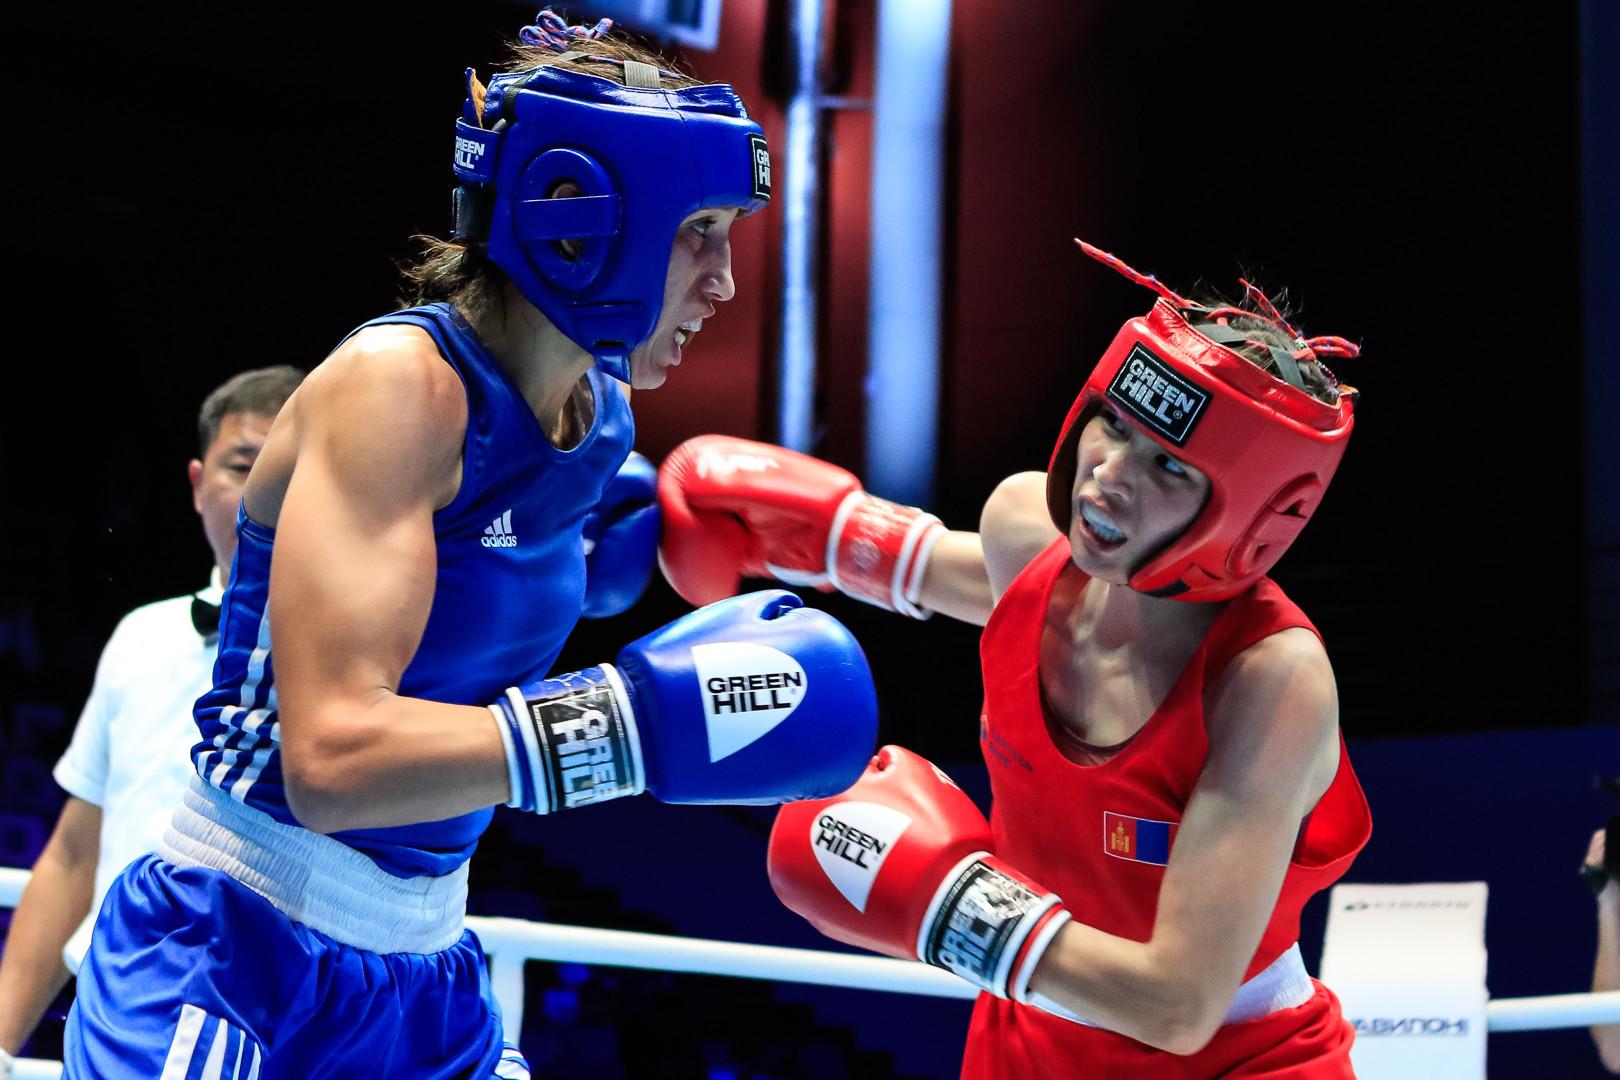 Rabab Cheddar of Morocco defeated Mungunsarn Balsan of Mongolia by the same score ©AIBA